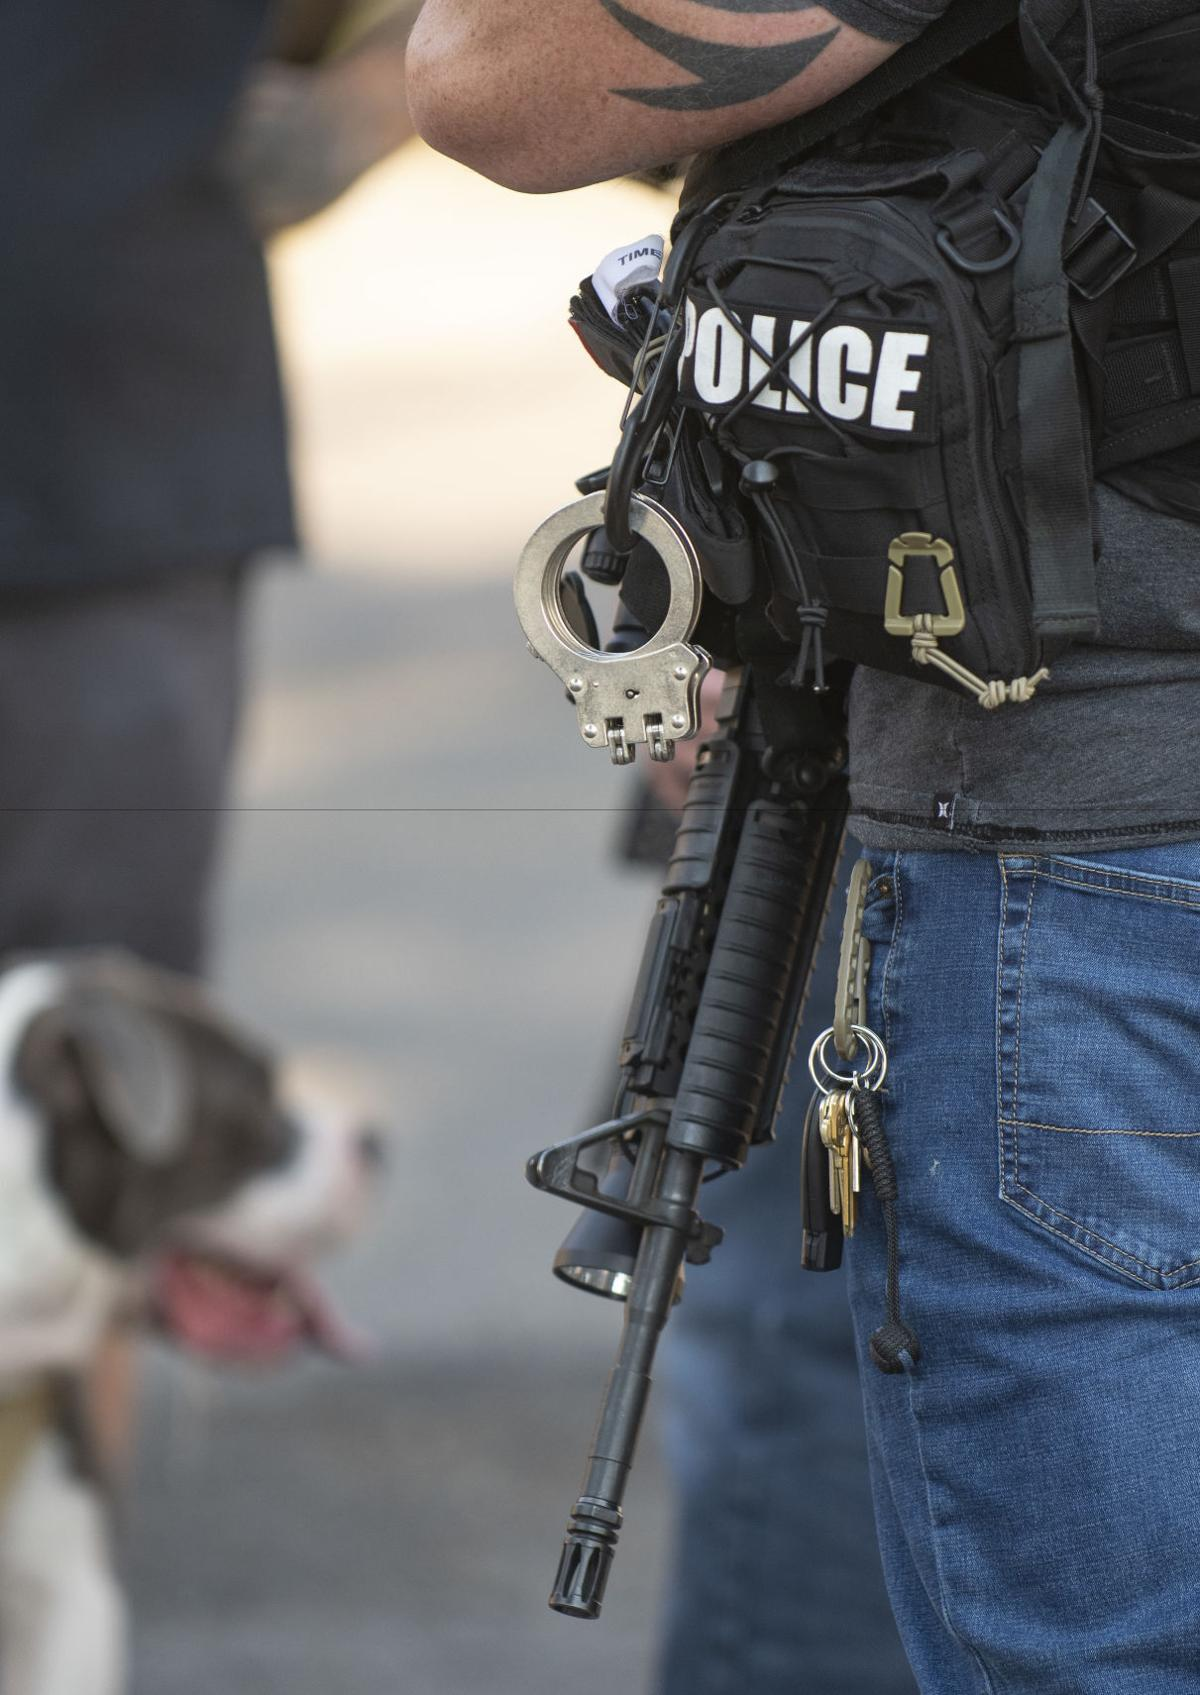 Law enforcement investigate shooting